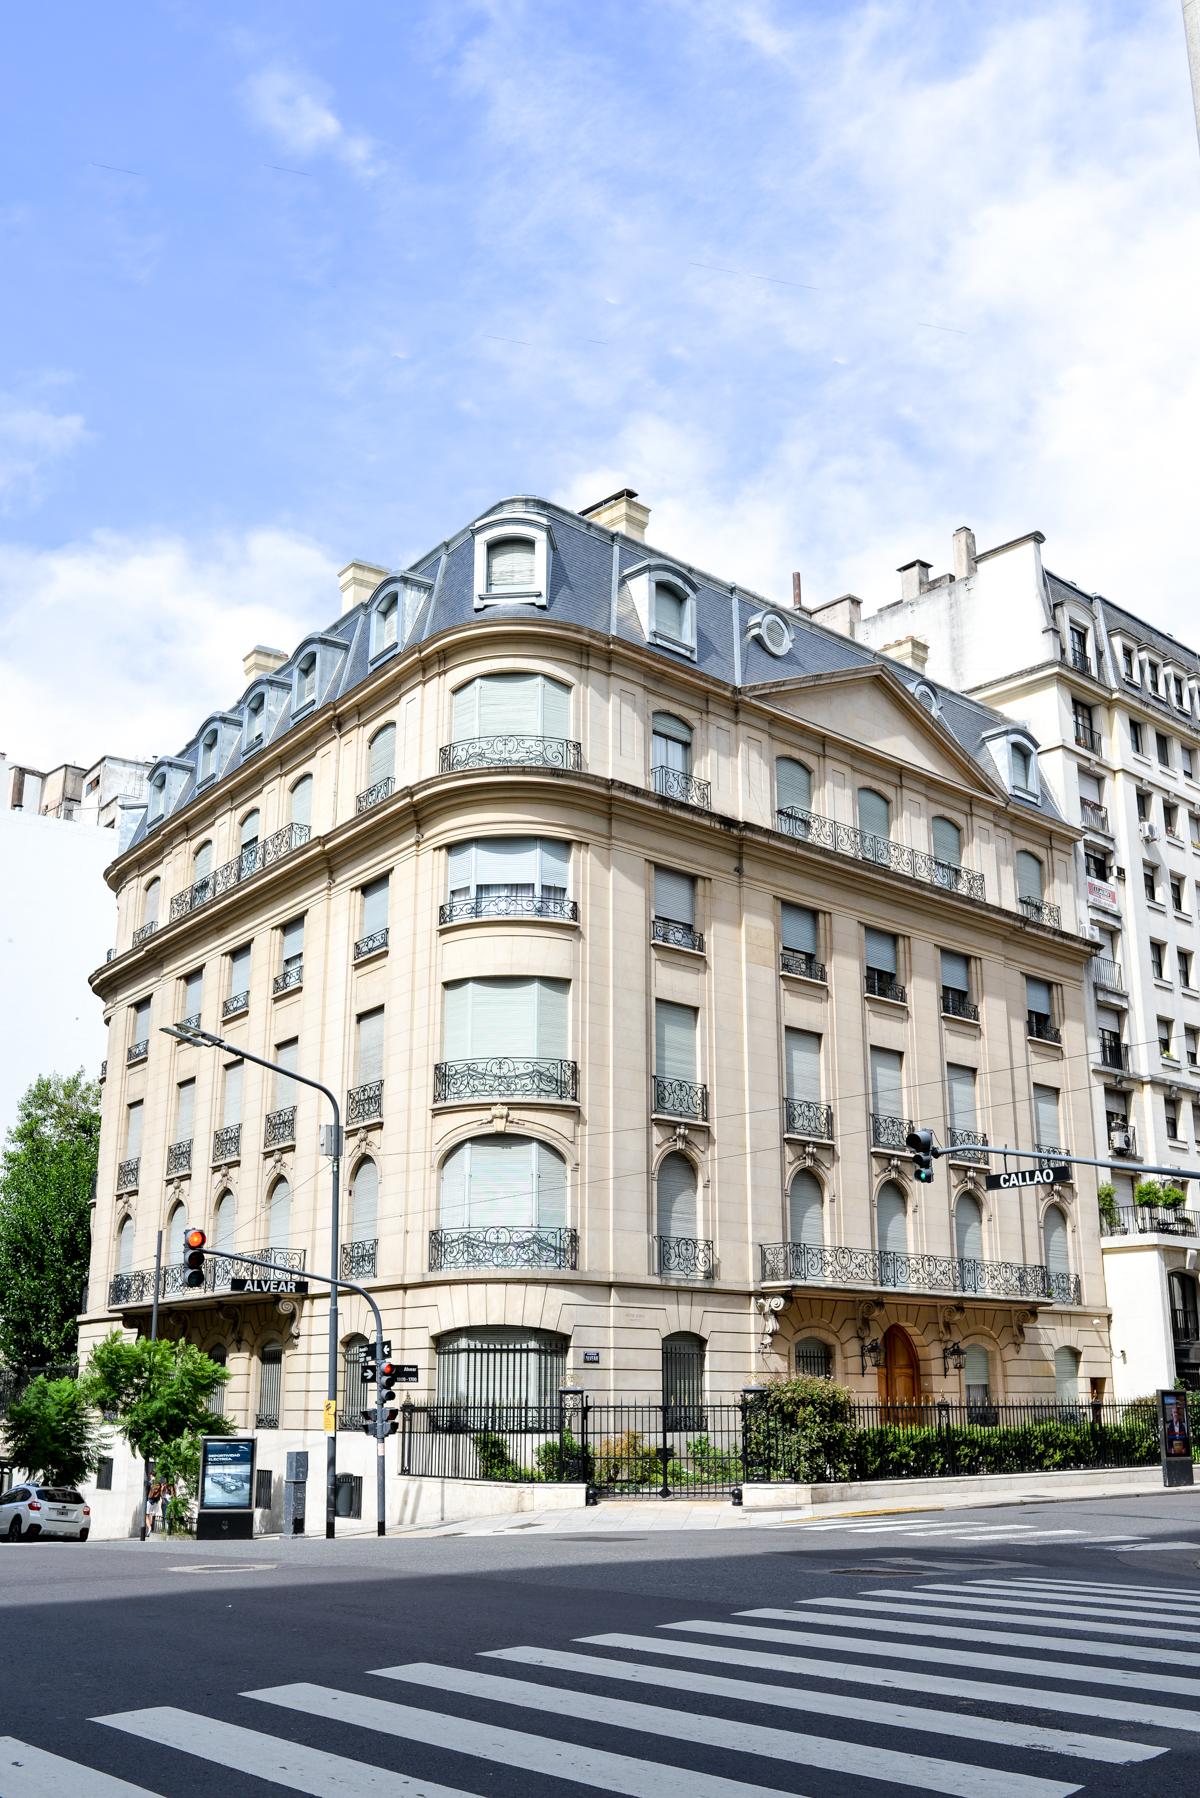 Stacie Flinner x Alvear Palace Hotel Blog-49